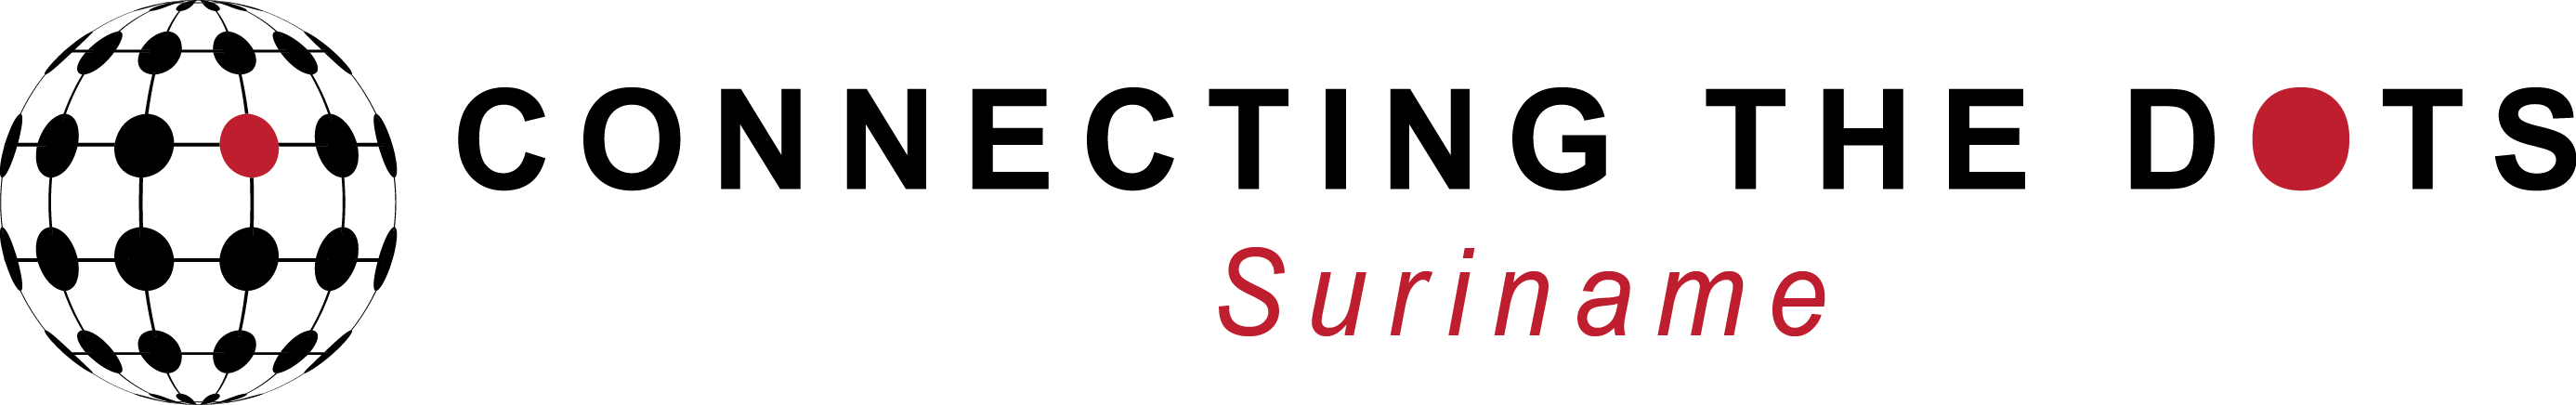 Connecting The Dots Suriname - CTDSur - Logo